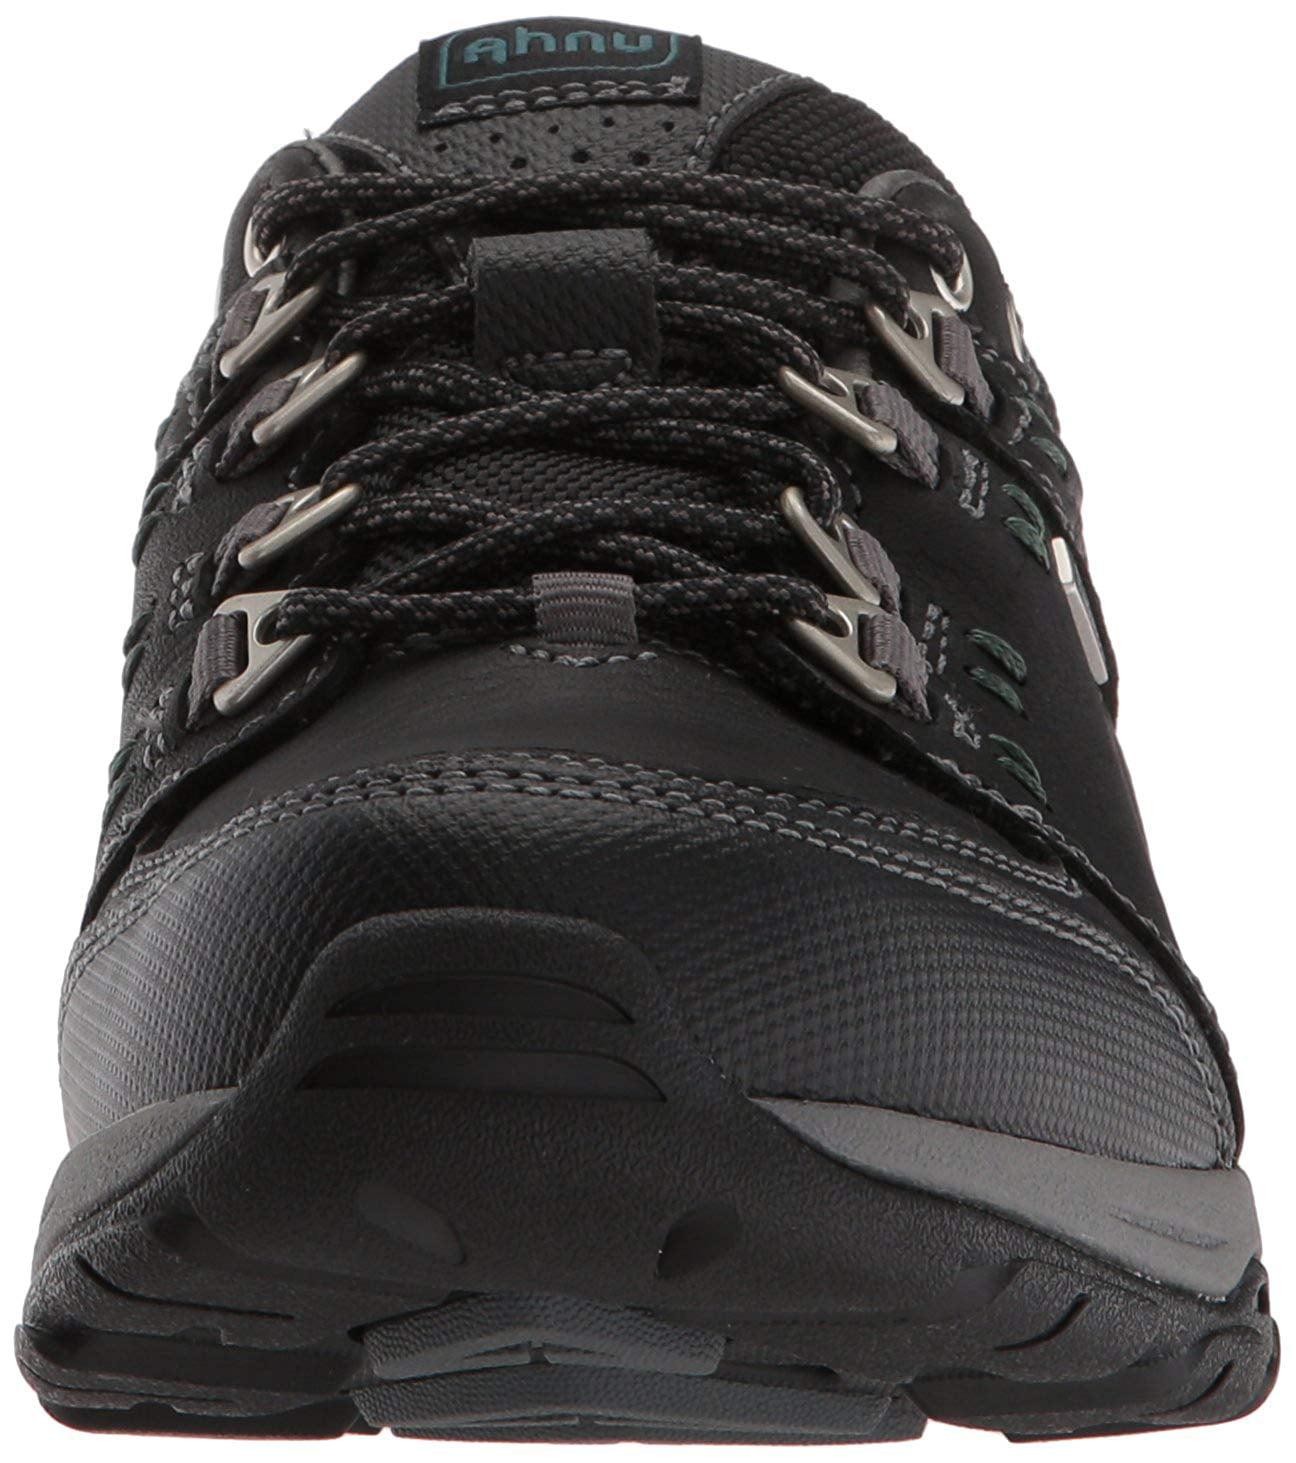 Ahnu Women's W Montara III FG Event Hiking Boot, Black, Size 5.0